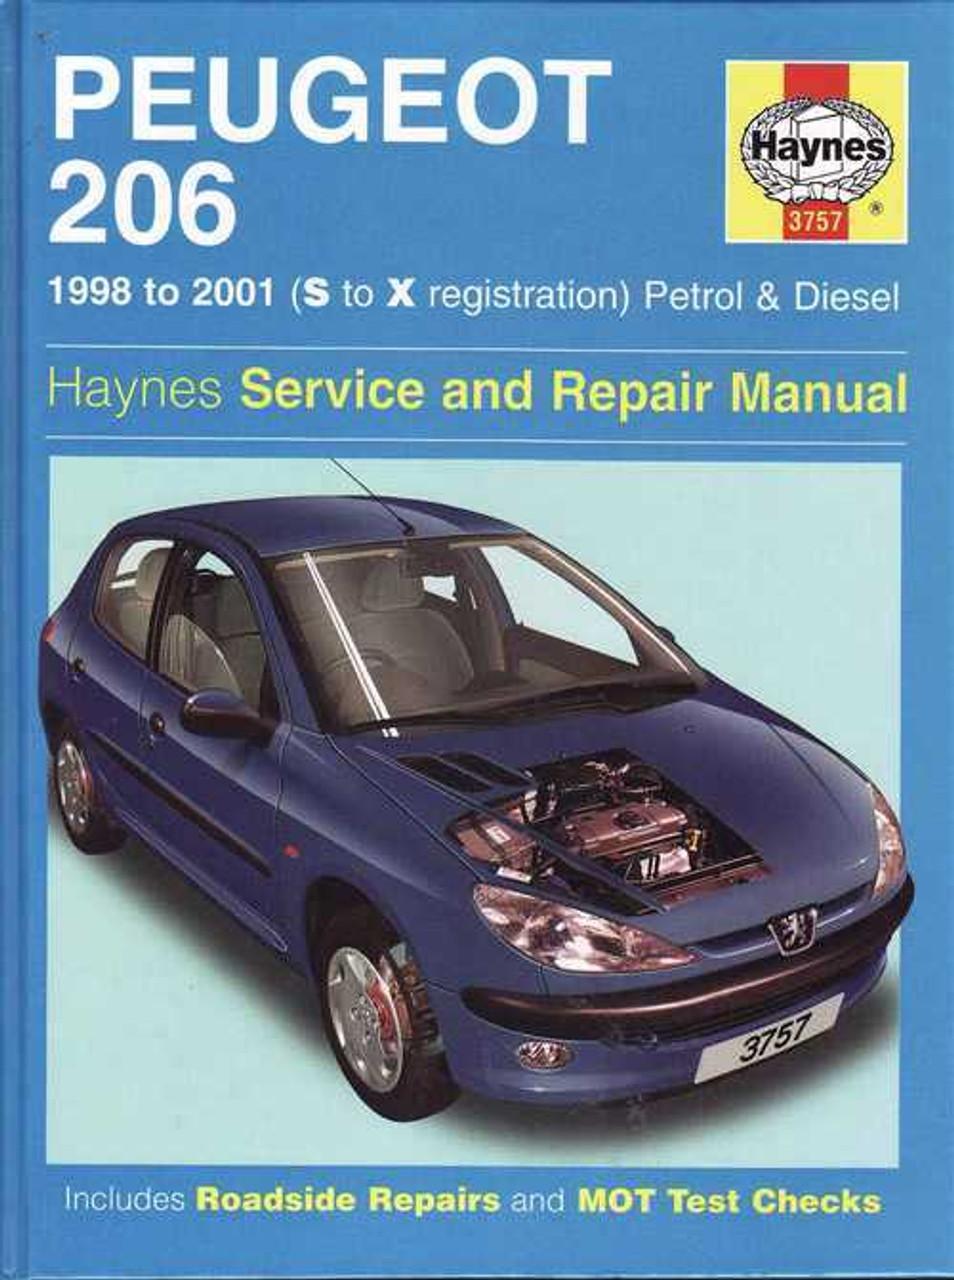 peugeot 206 1998 2001 workshop manual rh automotobookshop com au Peugeot Service Manual Peugeot 307 Service Manual